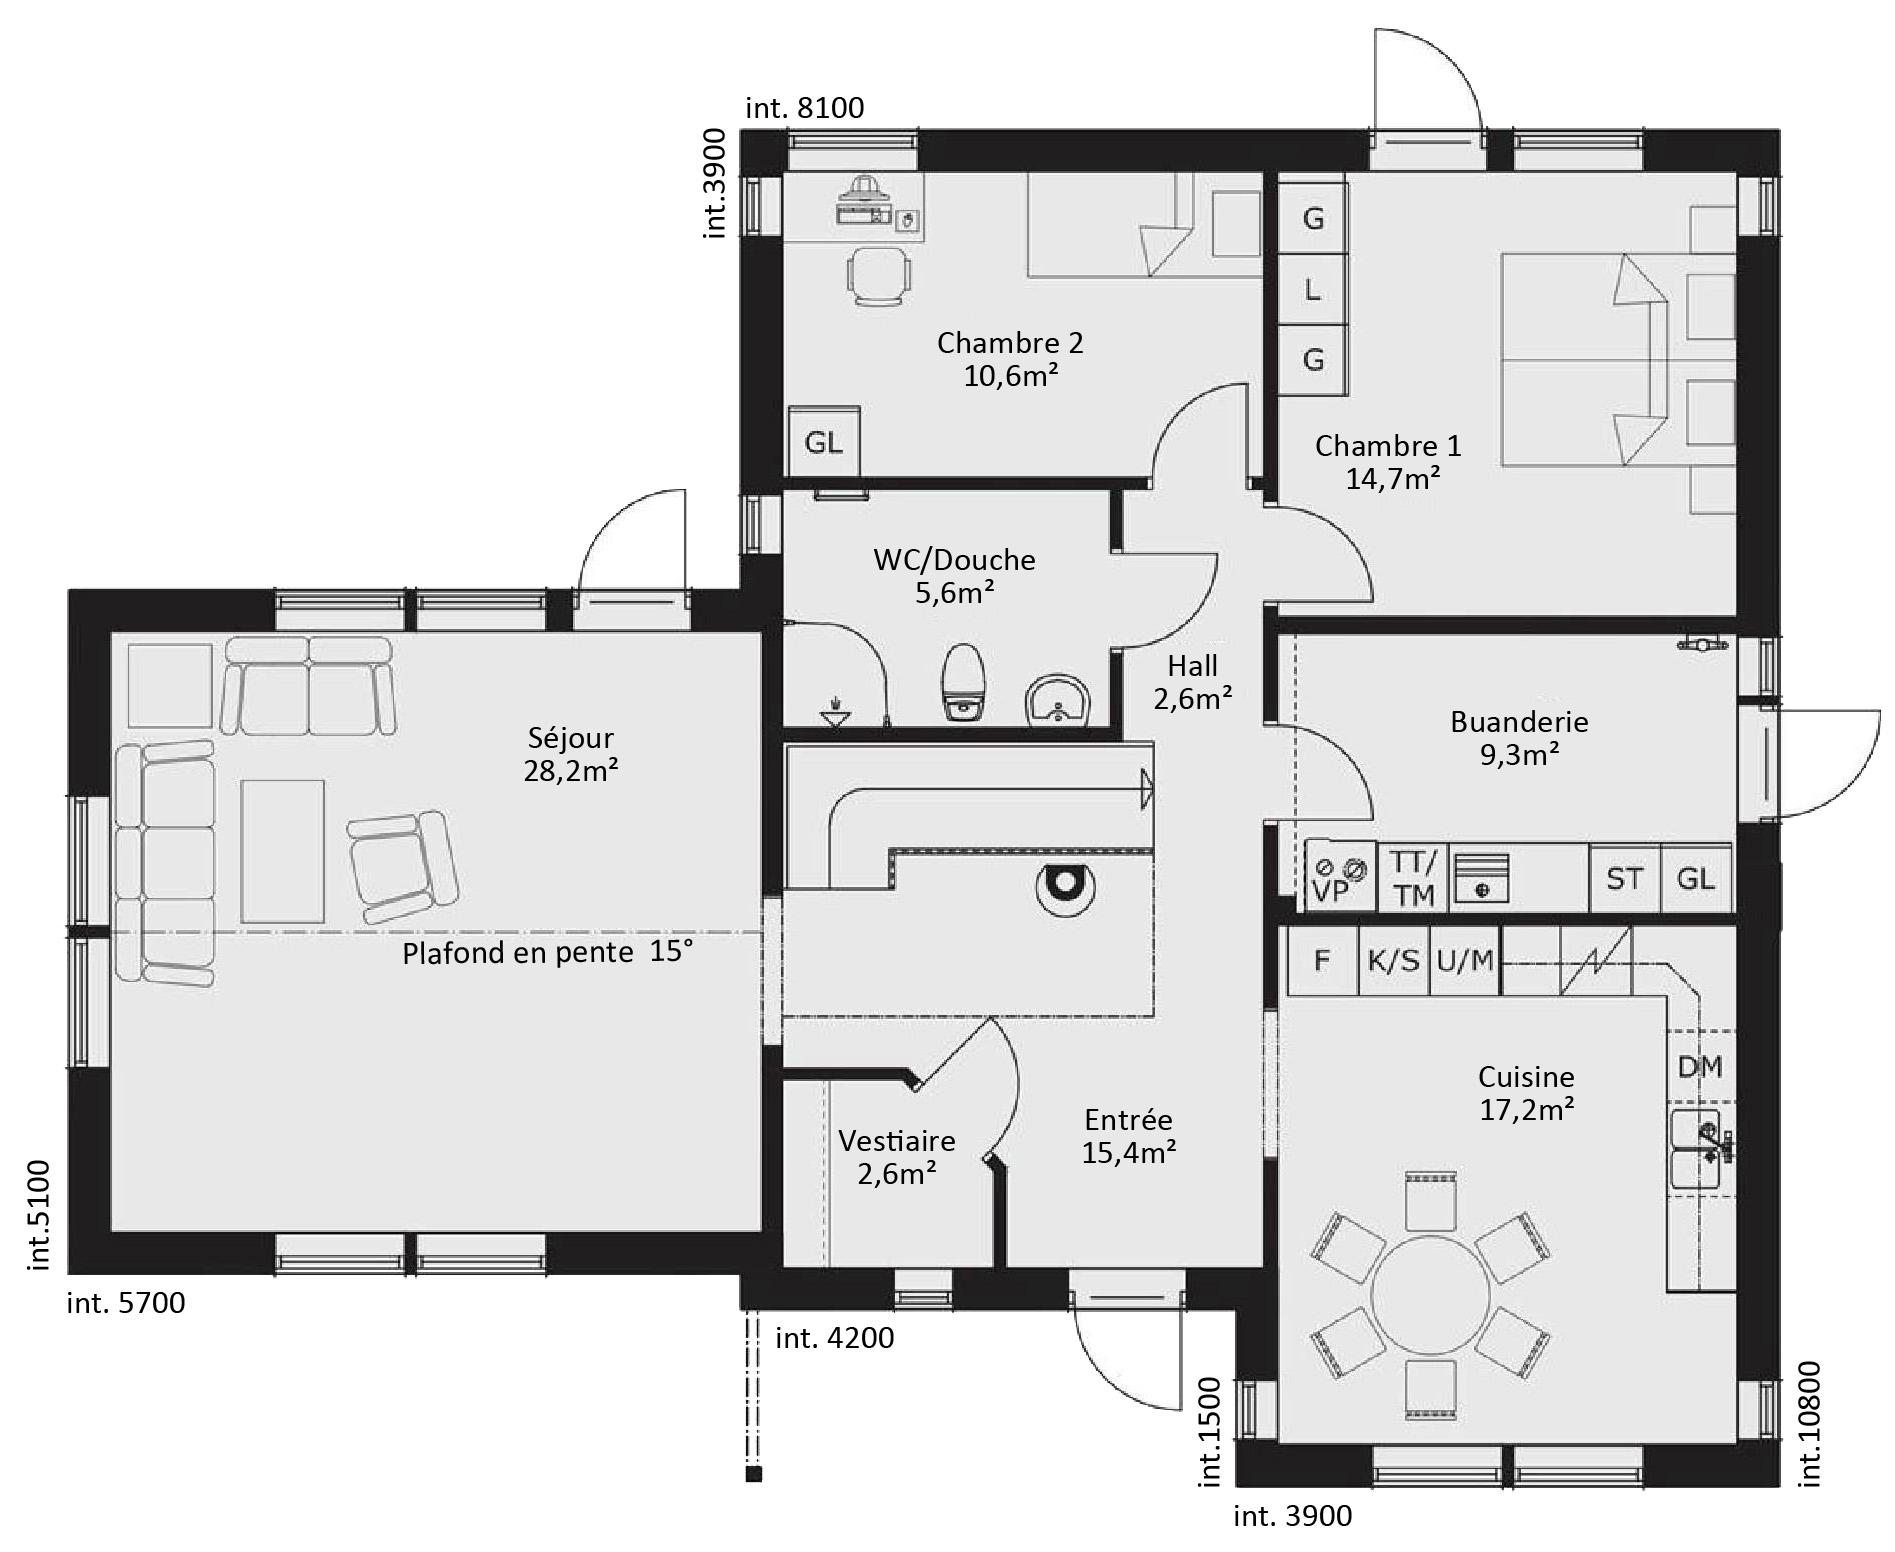 #201F20 Catalogue Plain Pied : Scandinavia 13 3021 plan maison suite parentale rdc 1895x1552 px @ aertt.com